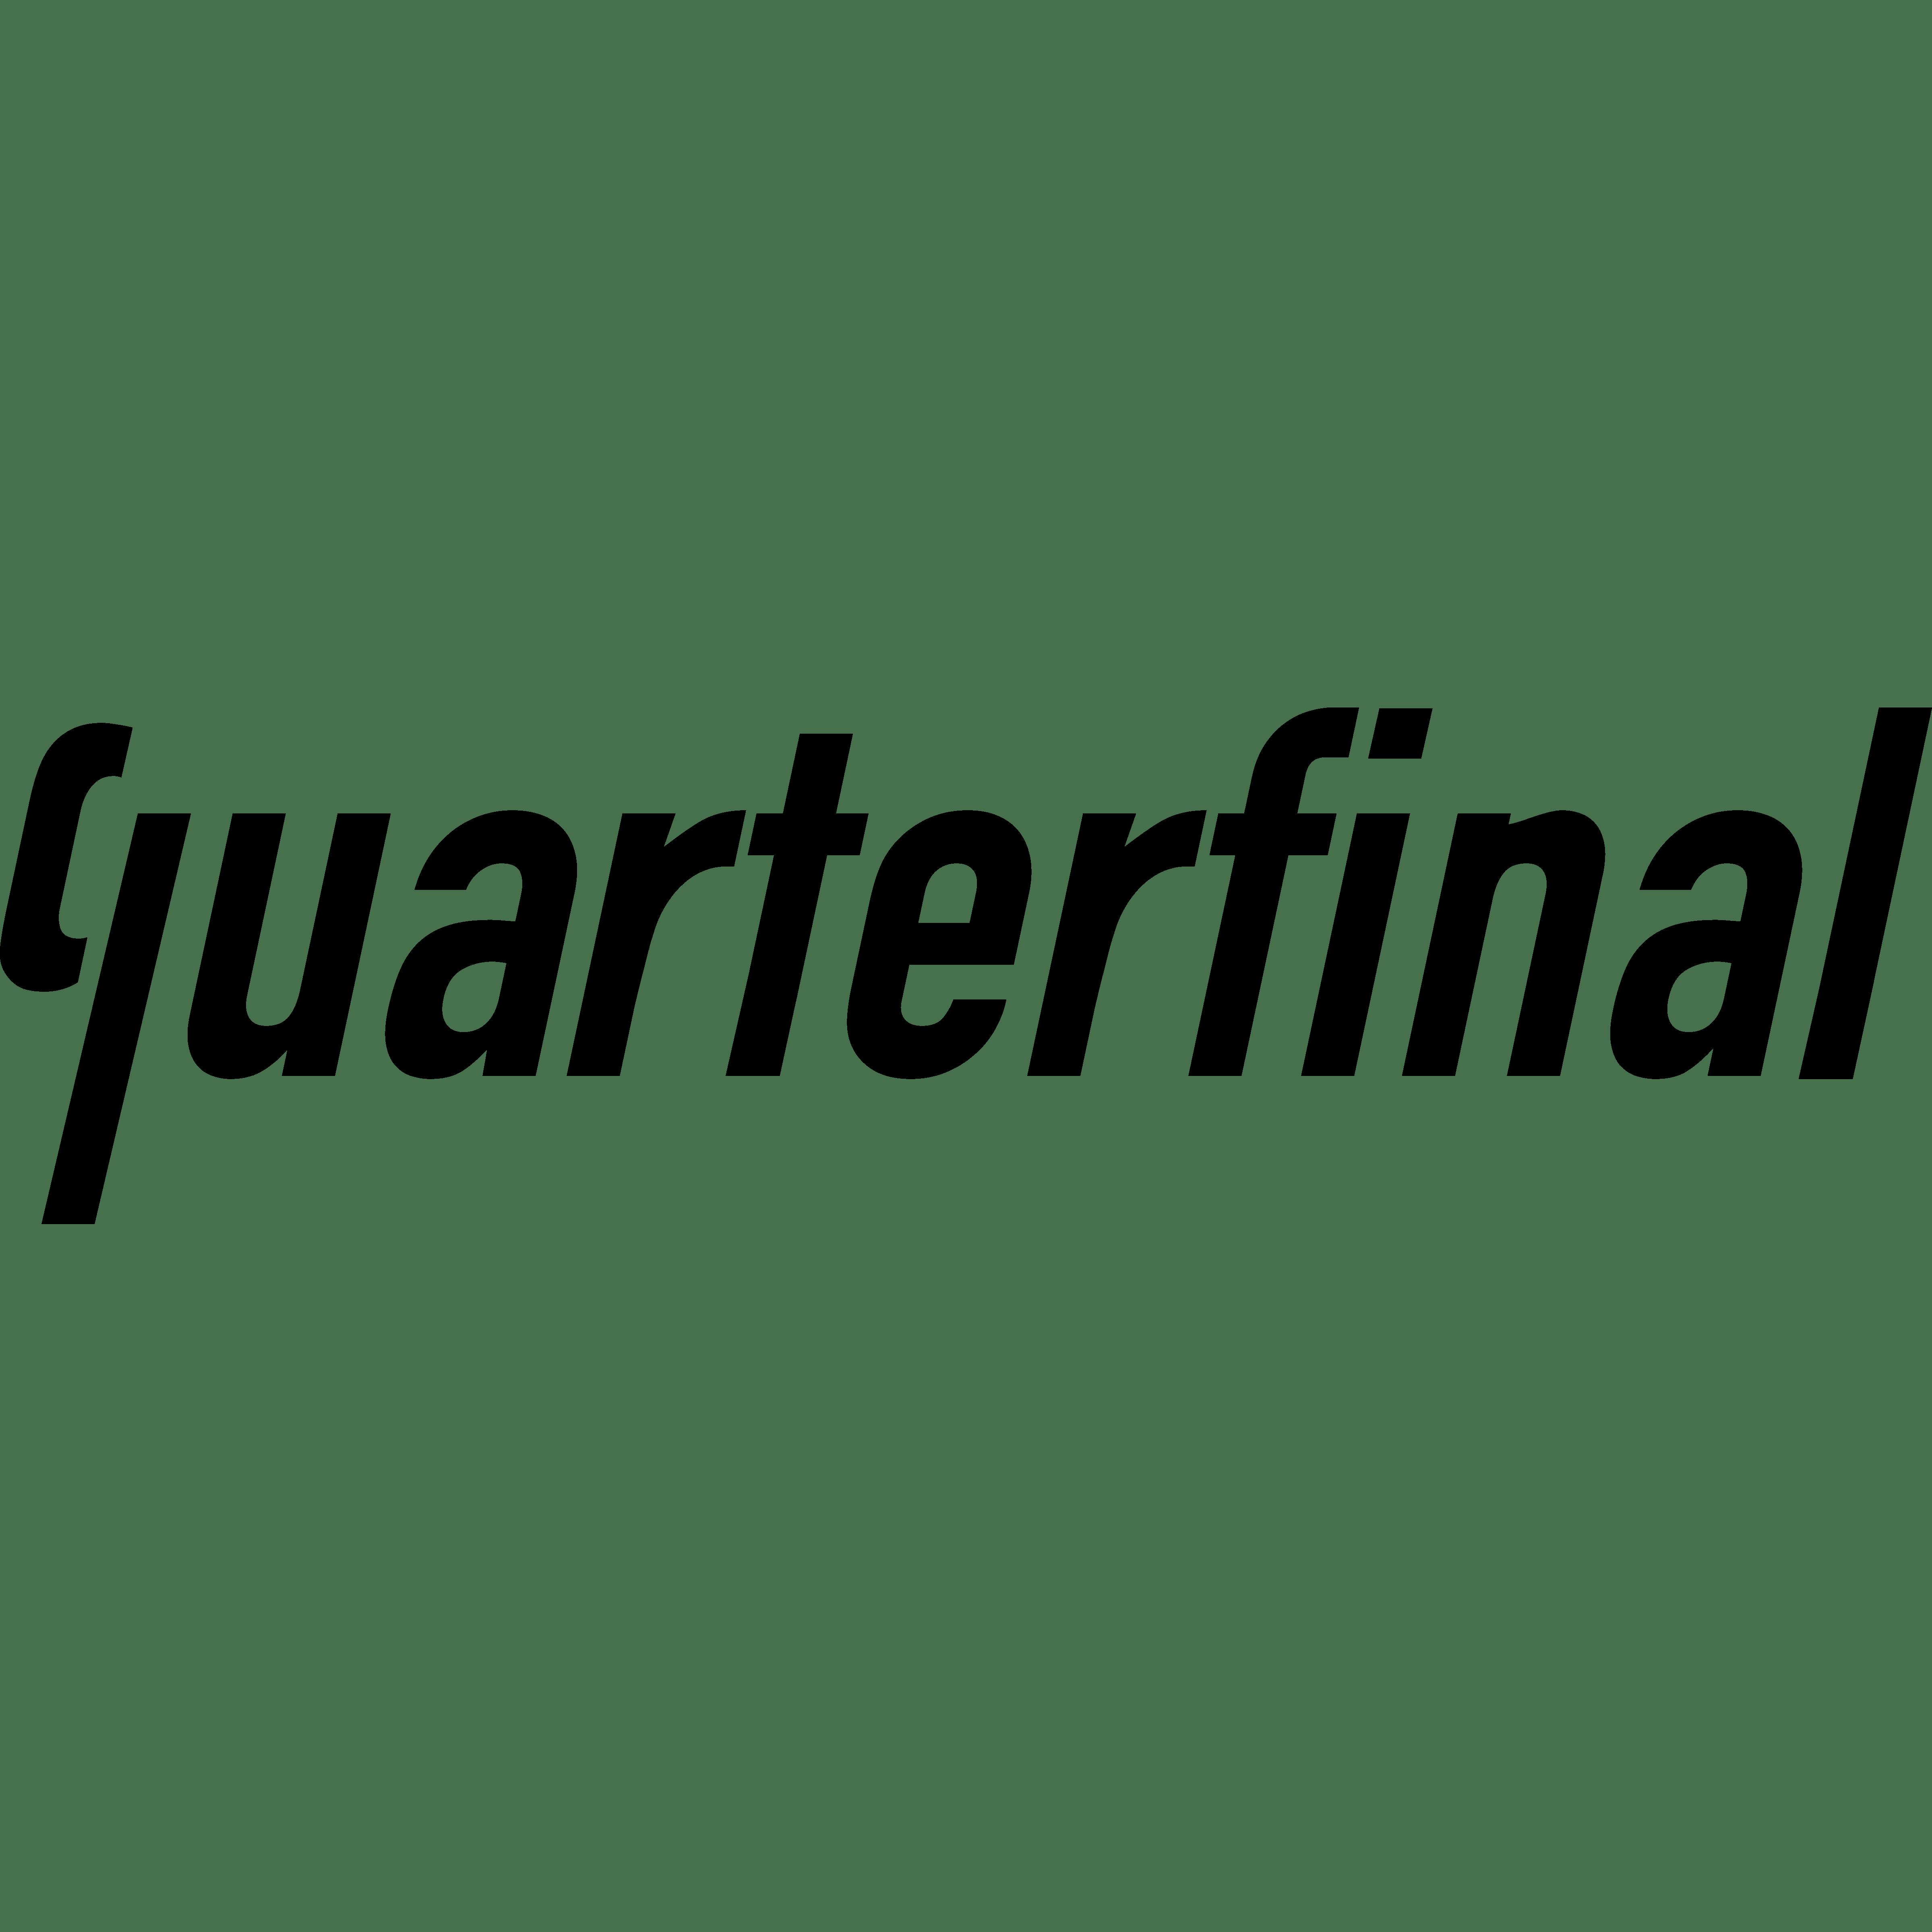 Quarterfinal